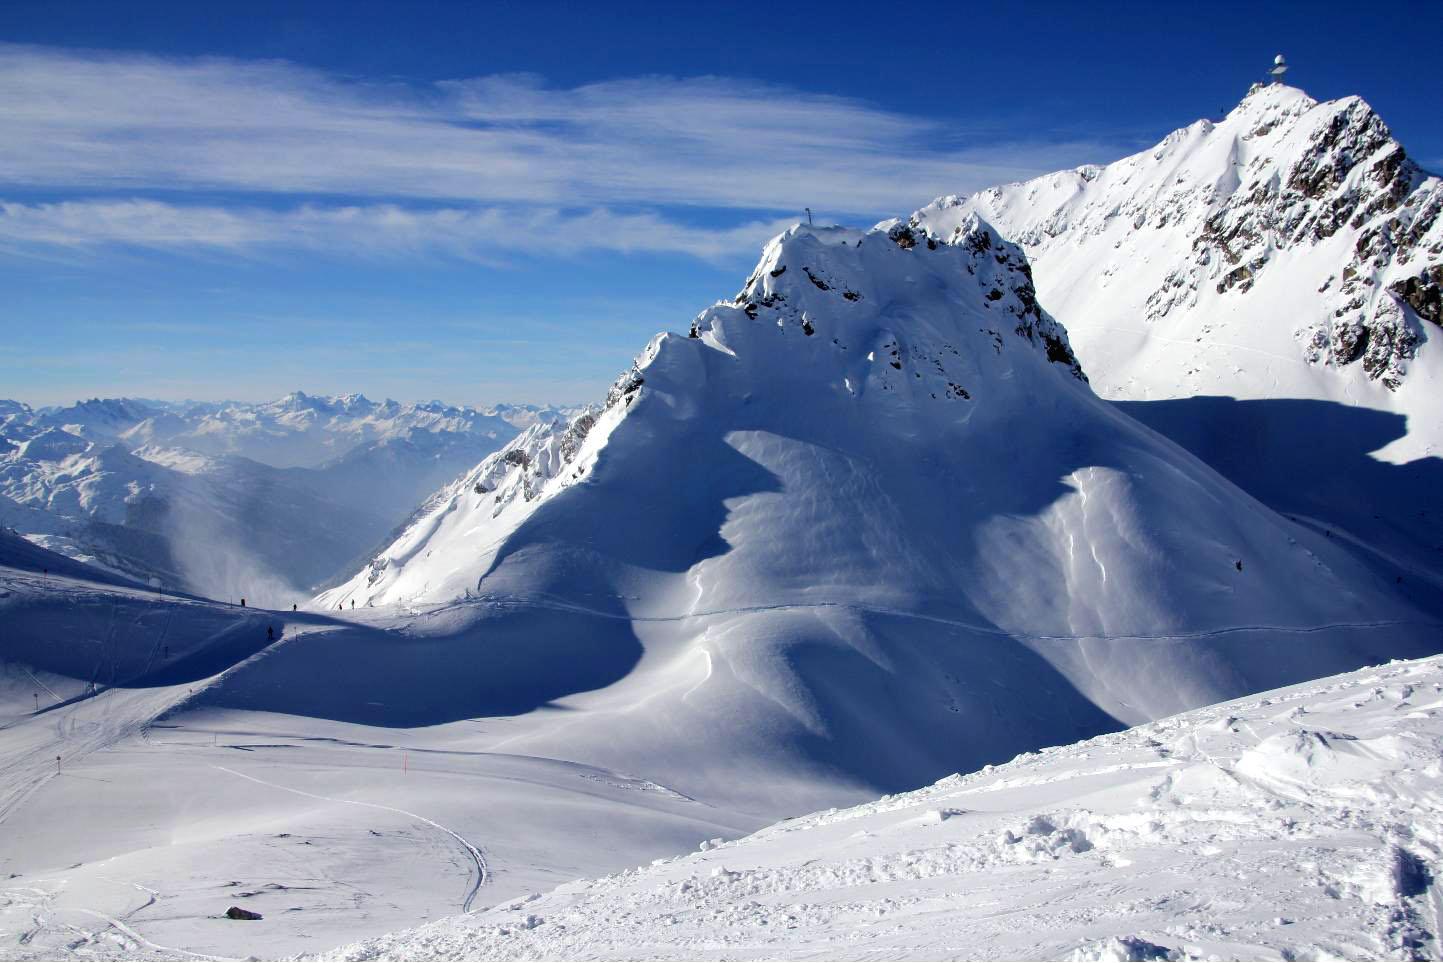 High Altitude Skiinig © JonoVernon-Powell